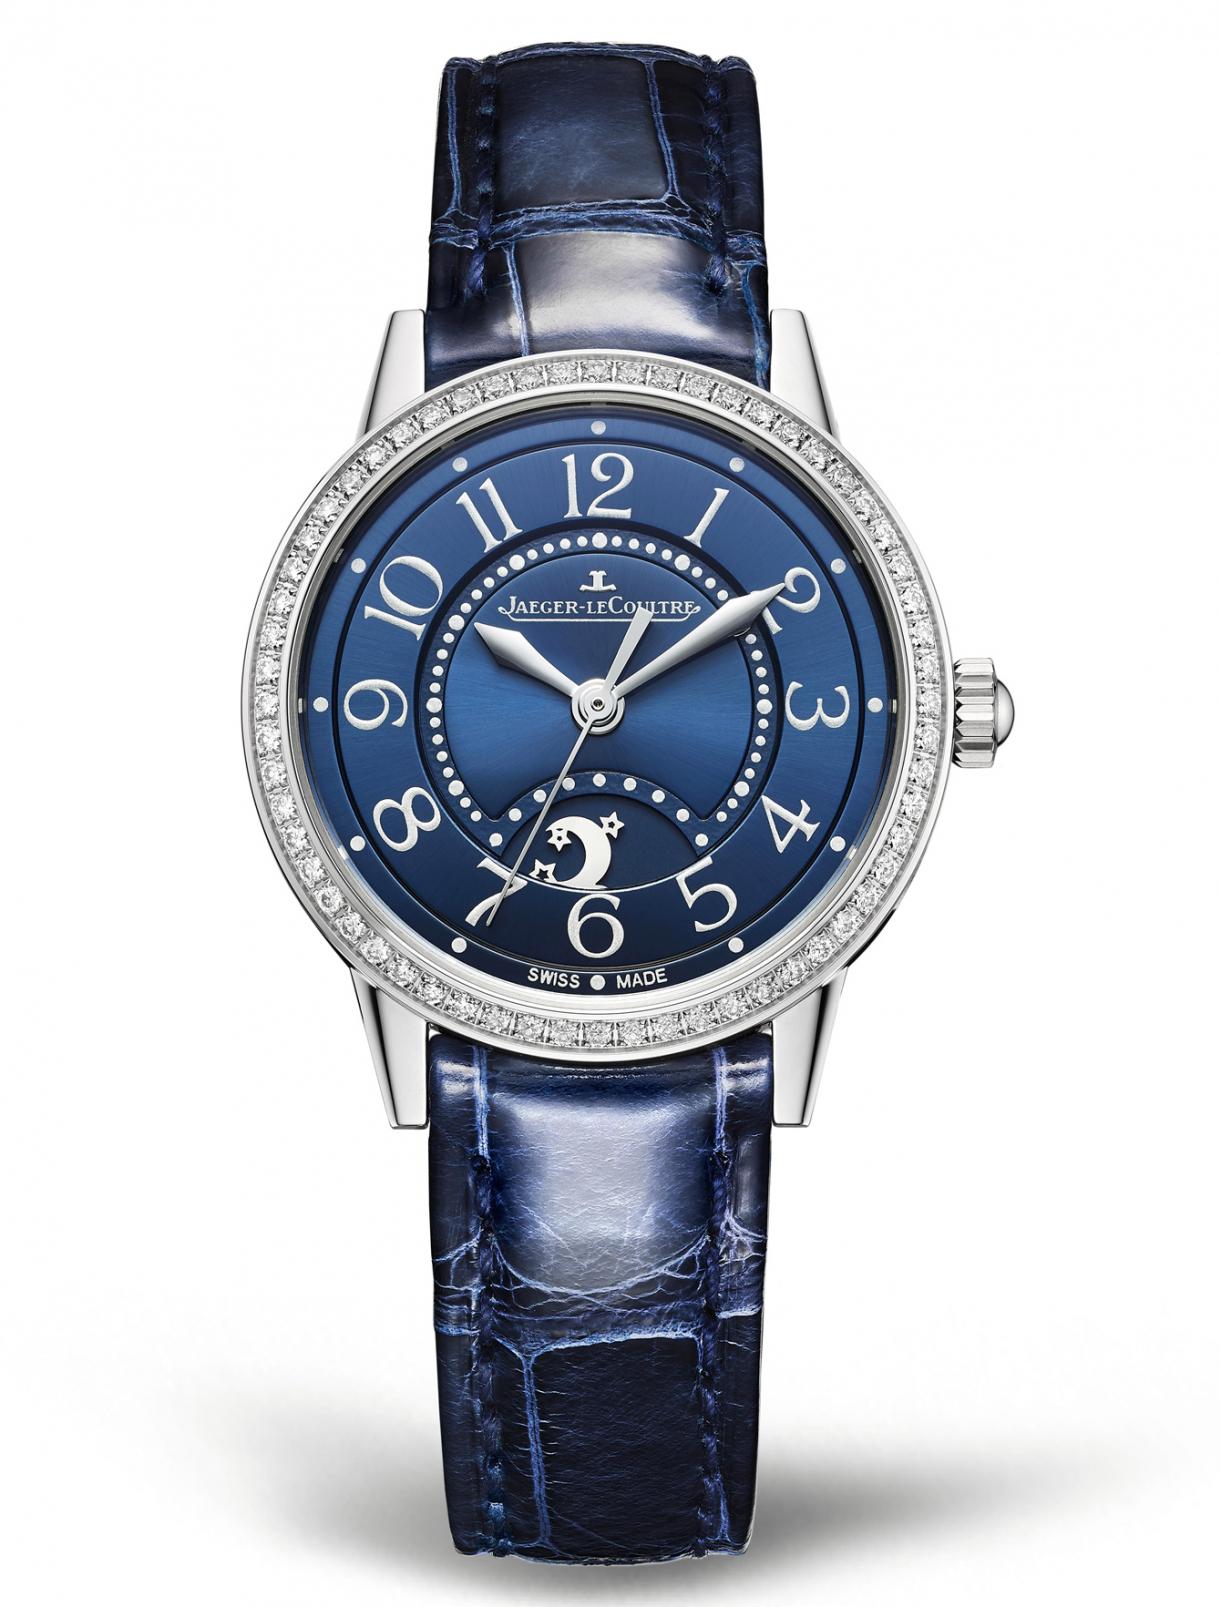 Часы Q3468480 Rendez-Vous Jaeger-LeCoultre  –  Общий вид